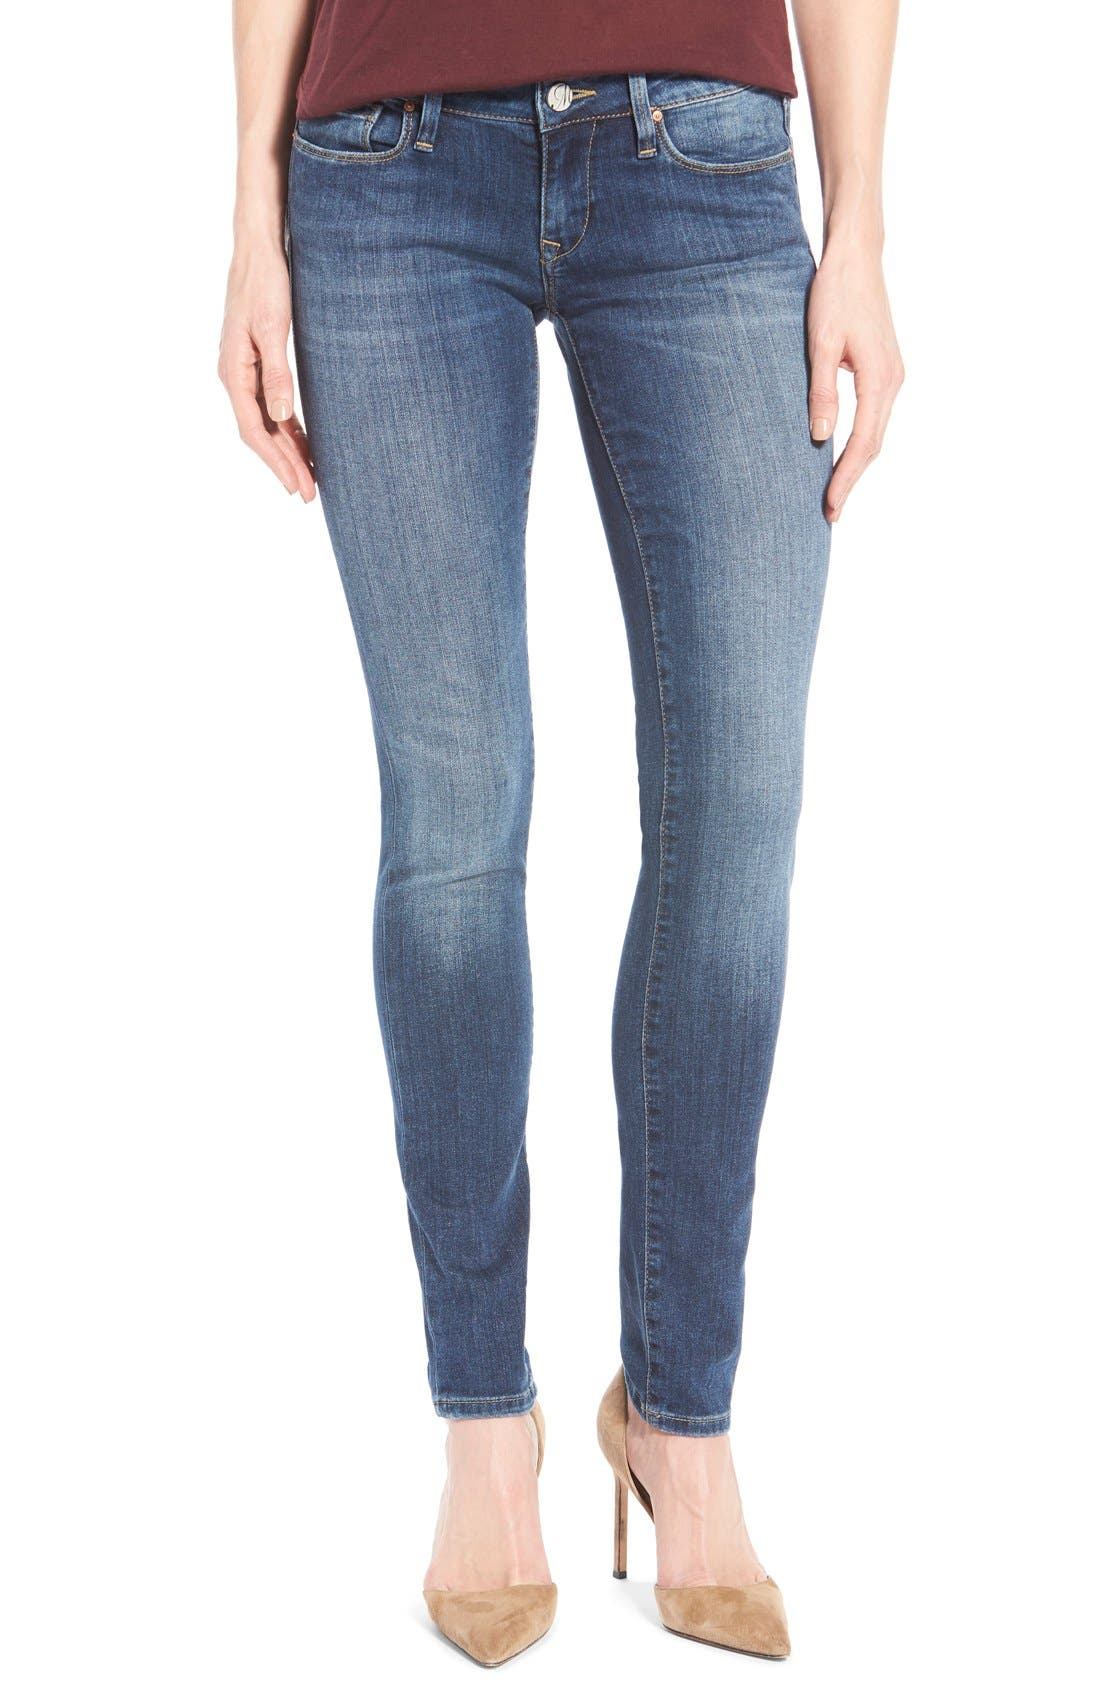 Alternate Image 1 Selected - Mavi Jeans 'Serena' Stretch Low Rise Skinny Jeans (Indigo Nolita)